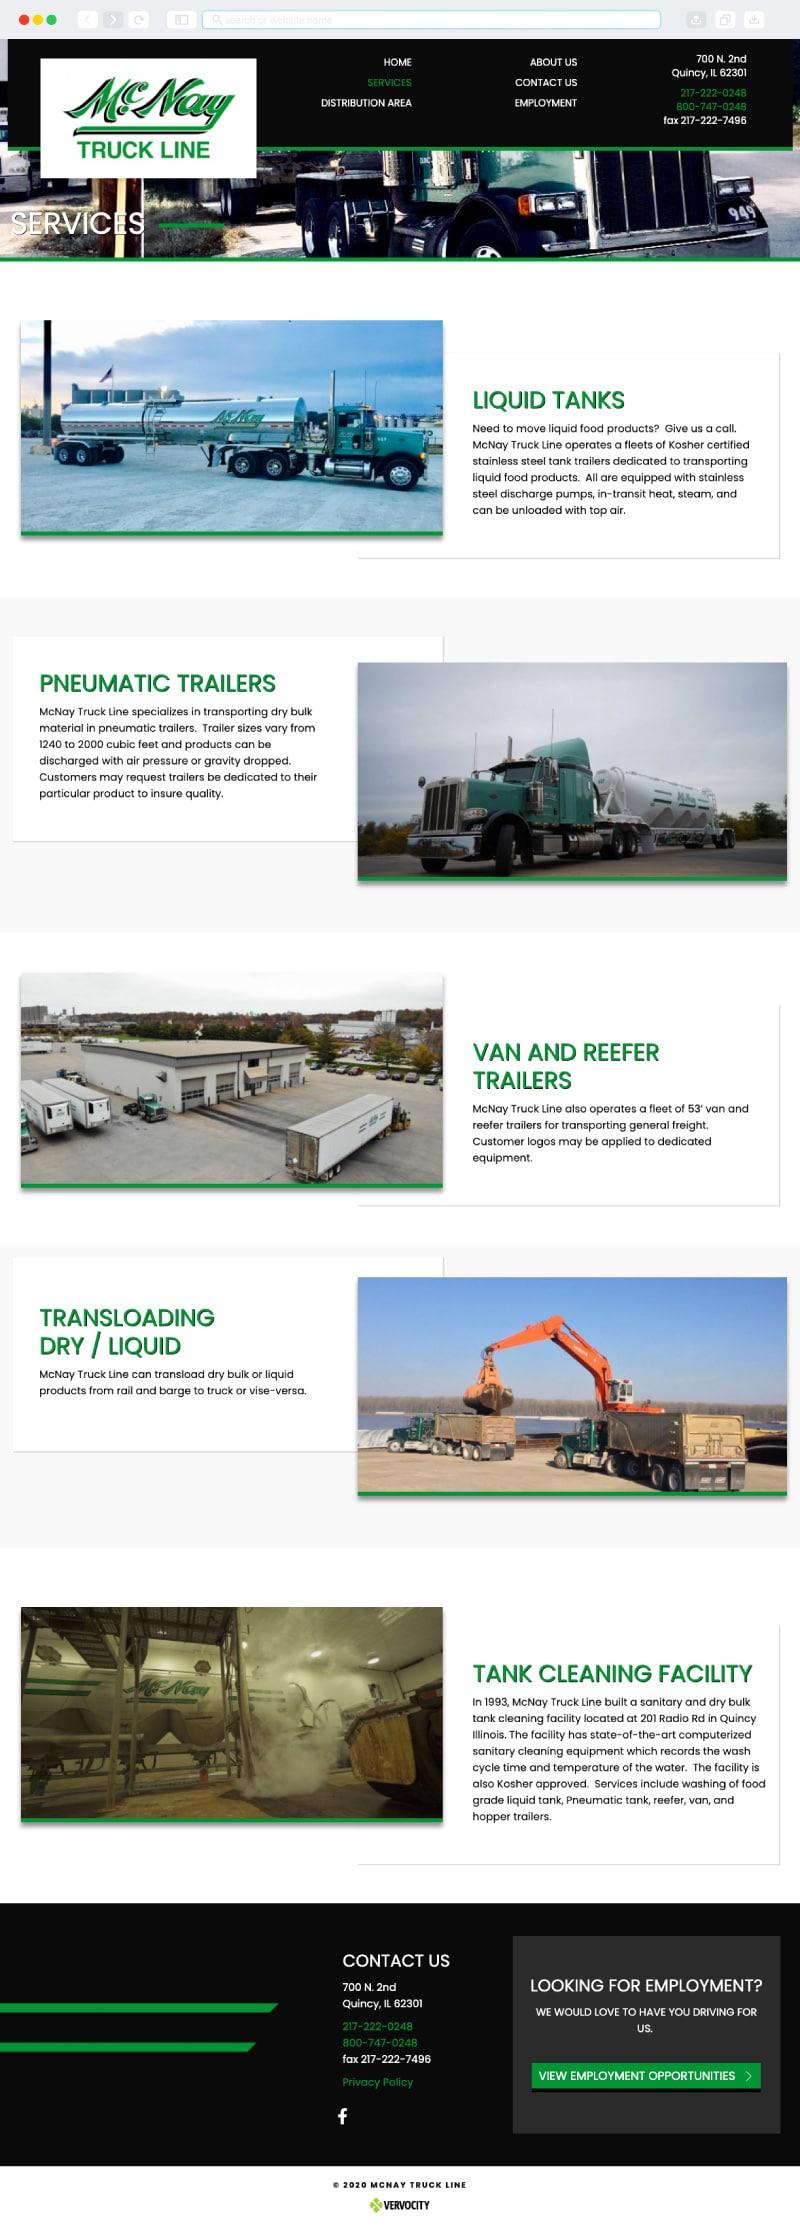 McNay Truck Line Interior Page   Vervocity